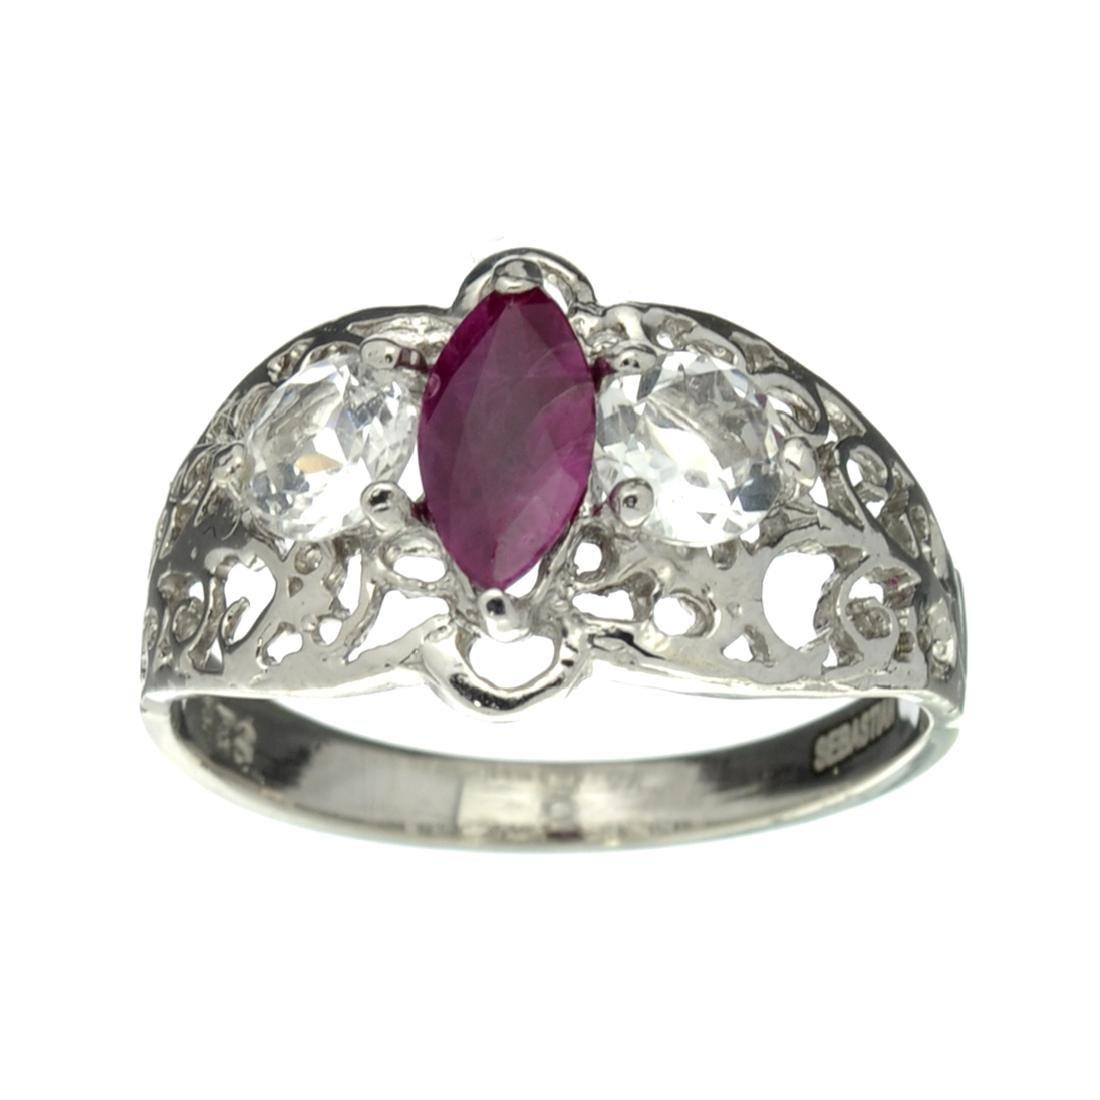 APP: 0.5k Fine Jewelry Designer Sebastian, 2.04CT Ruby